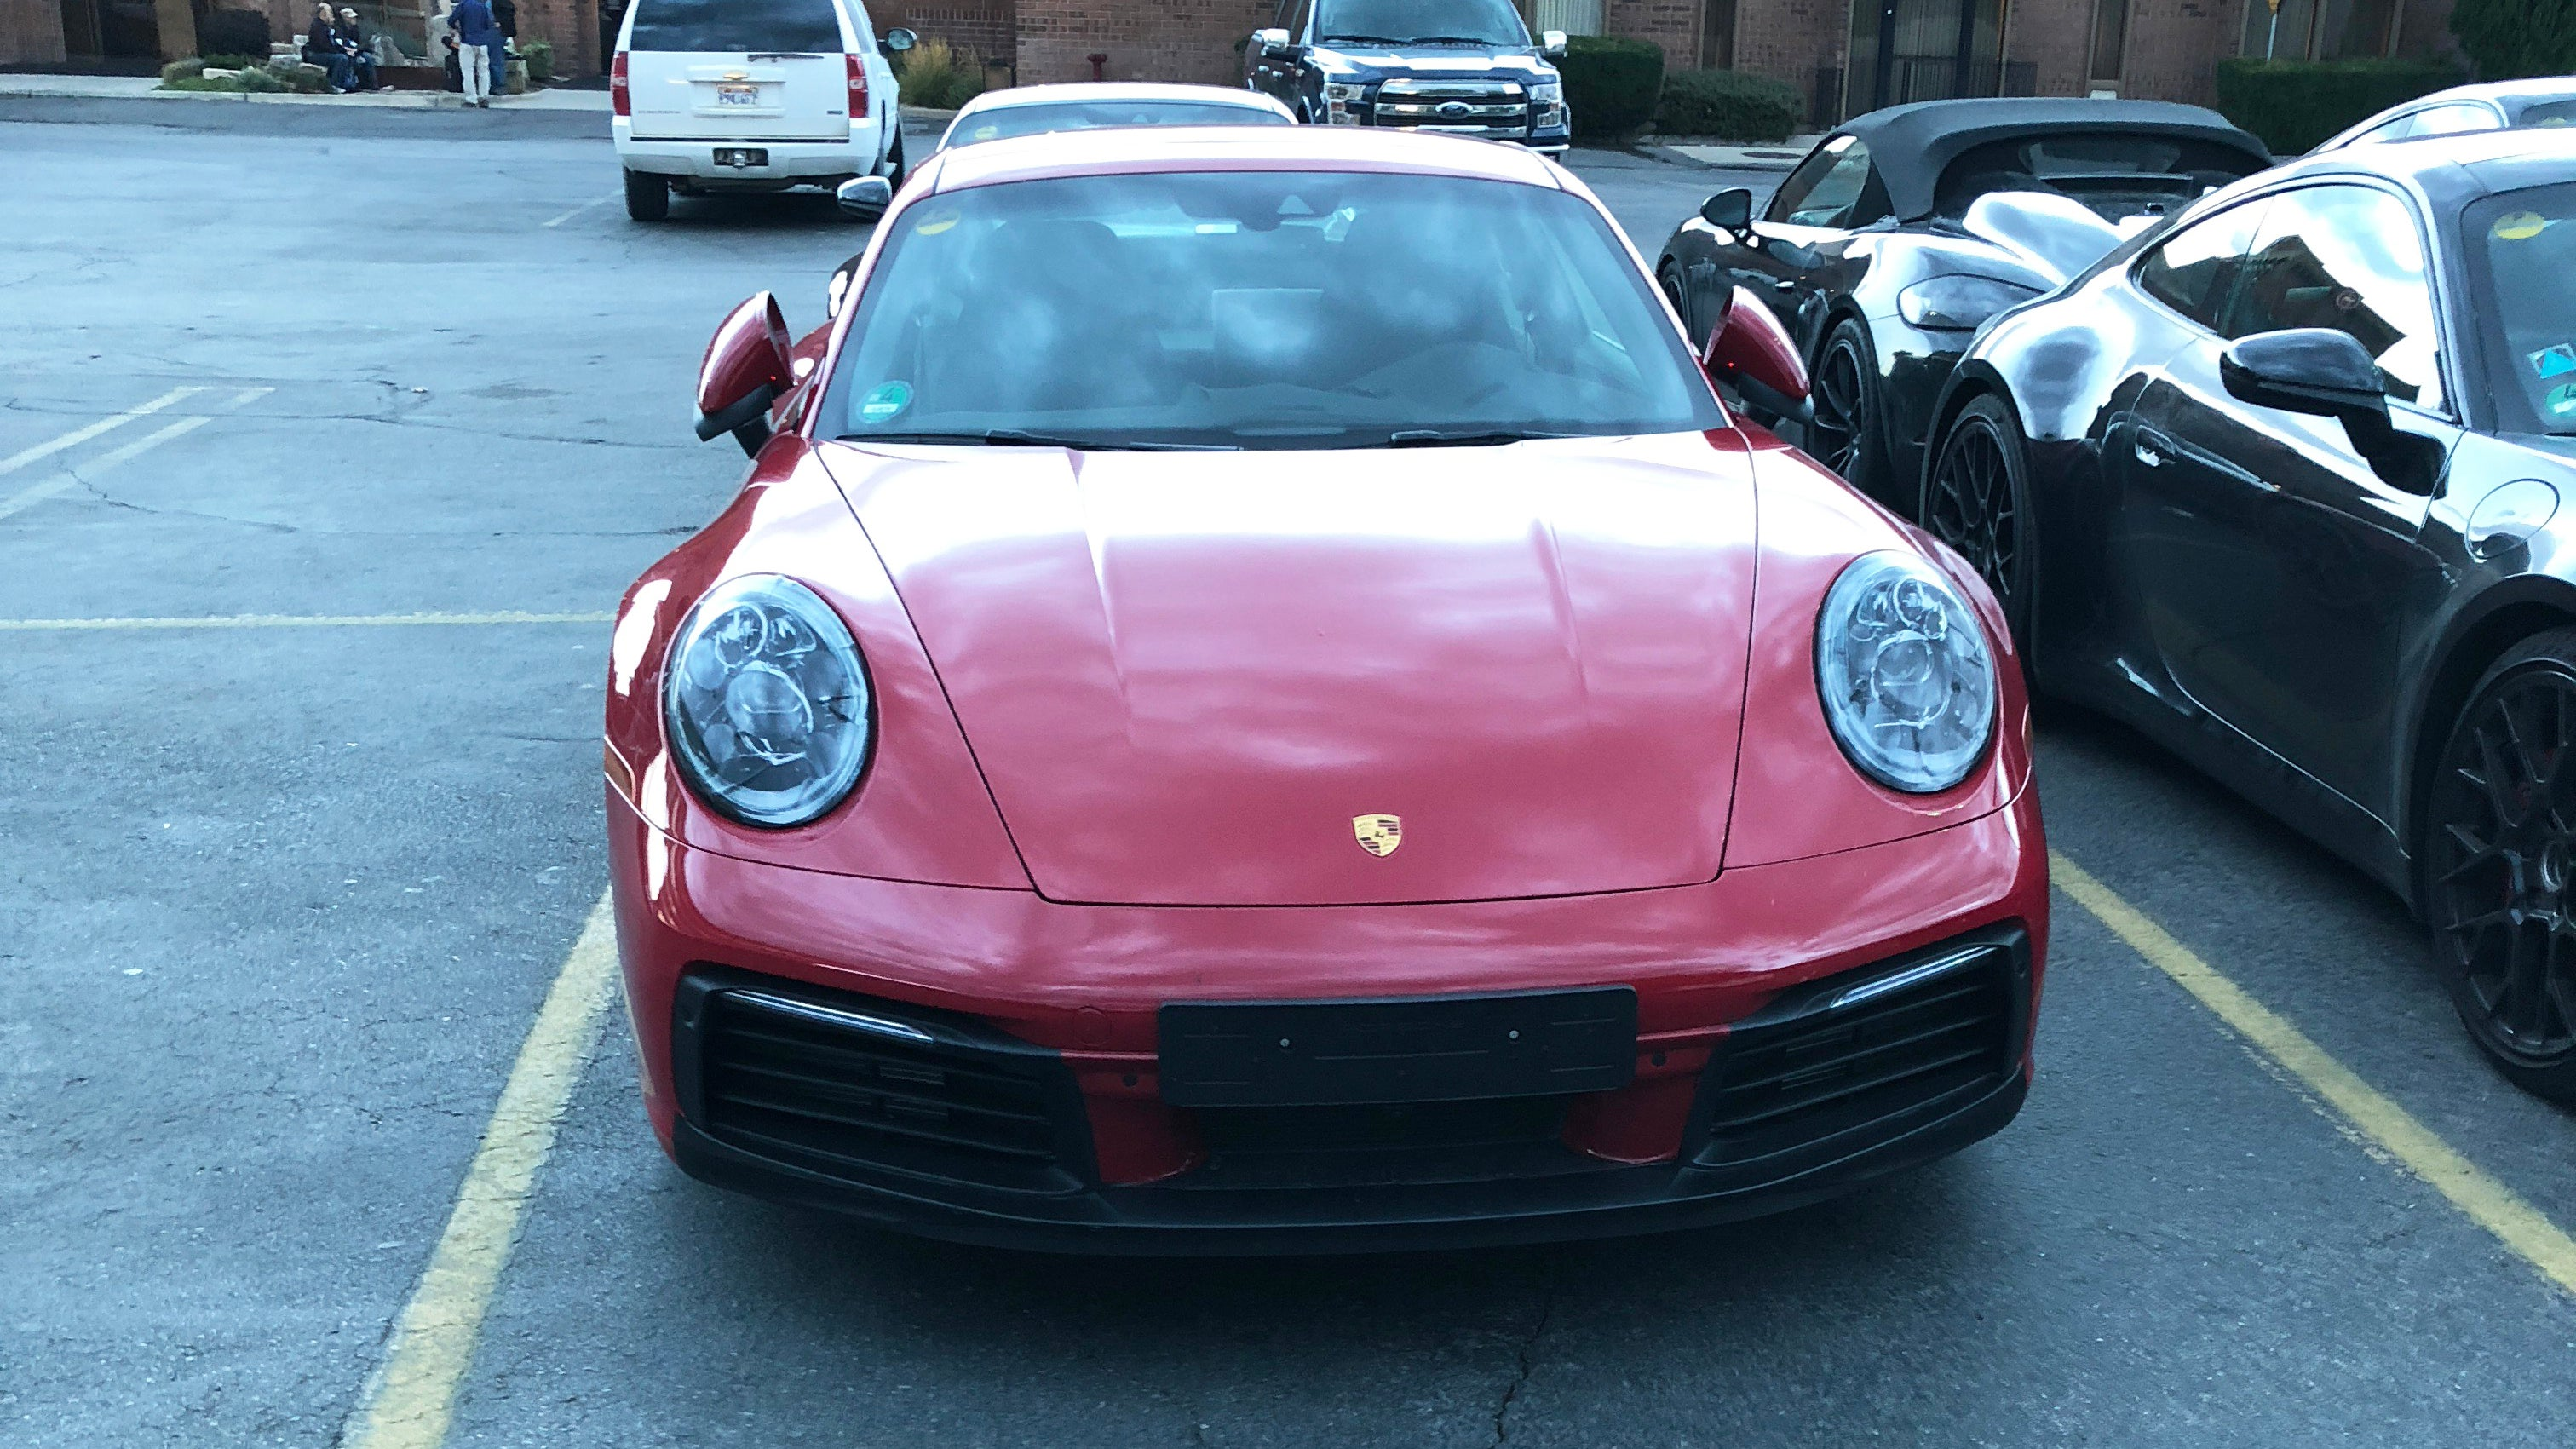 2018 - [Porsche] 911 - Page 9 S9rpk7n7hrevpaqlhygi